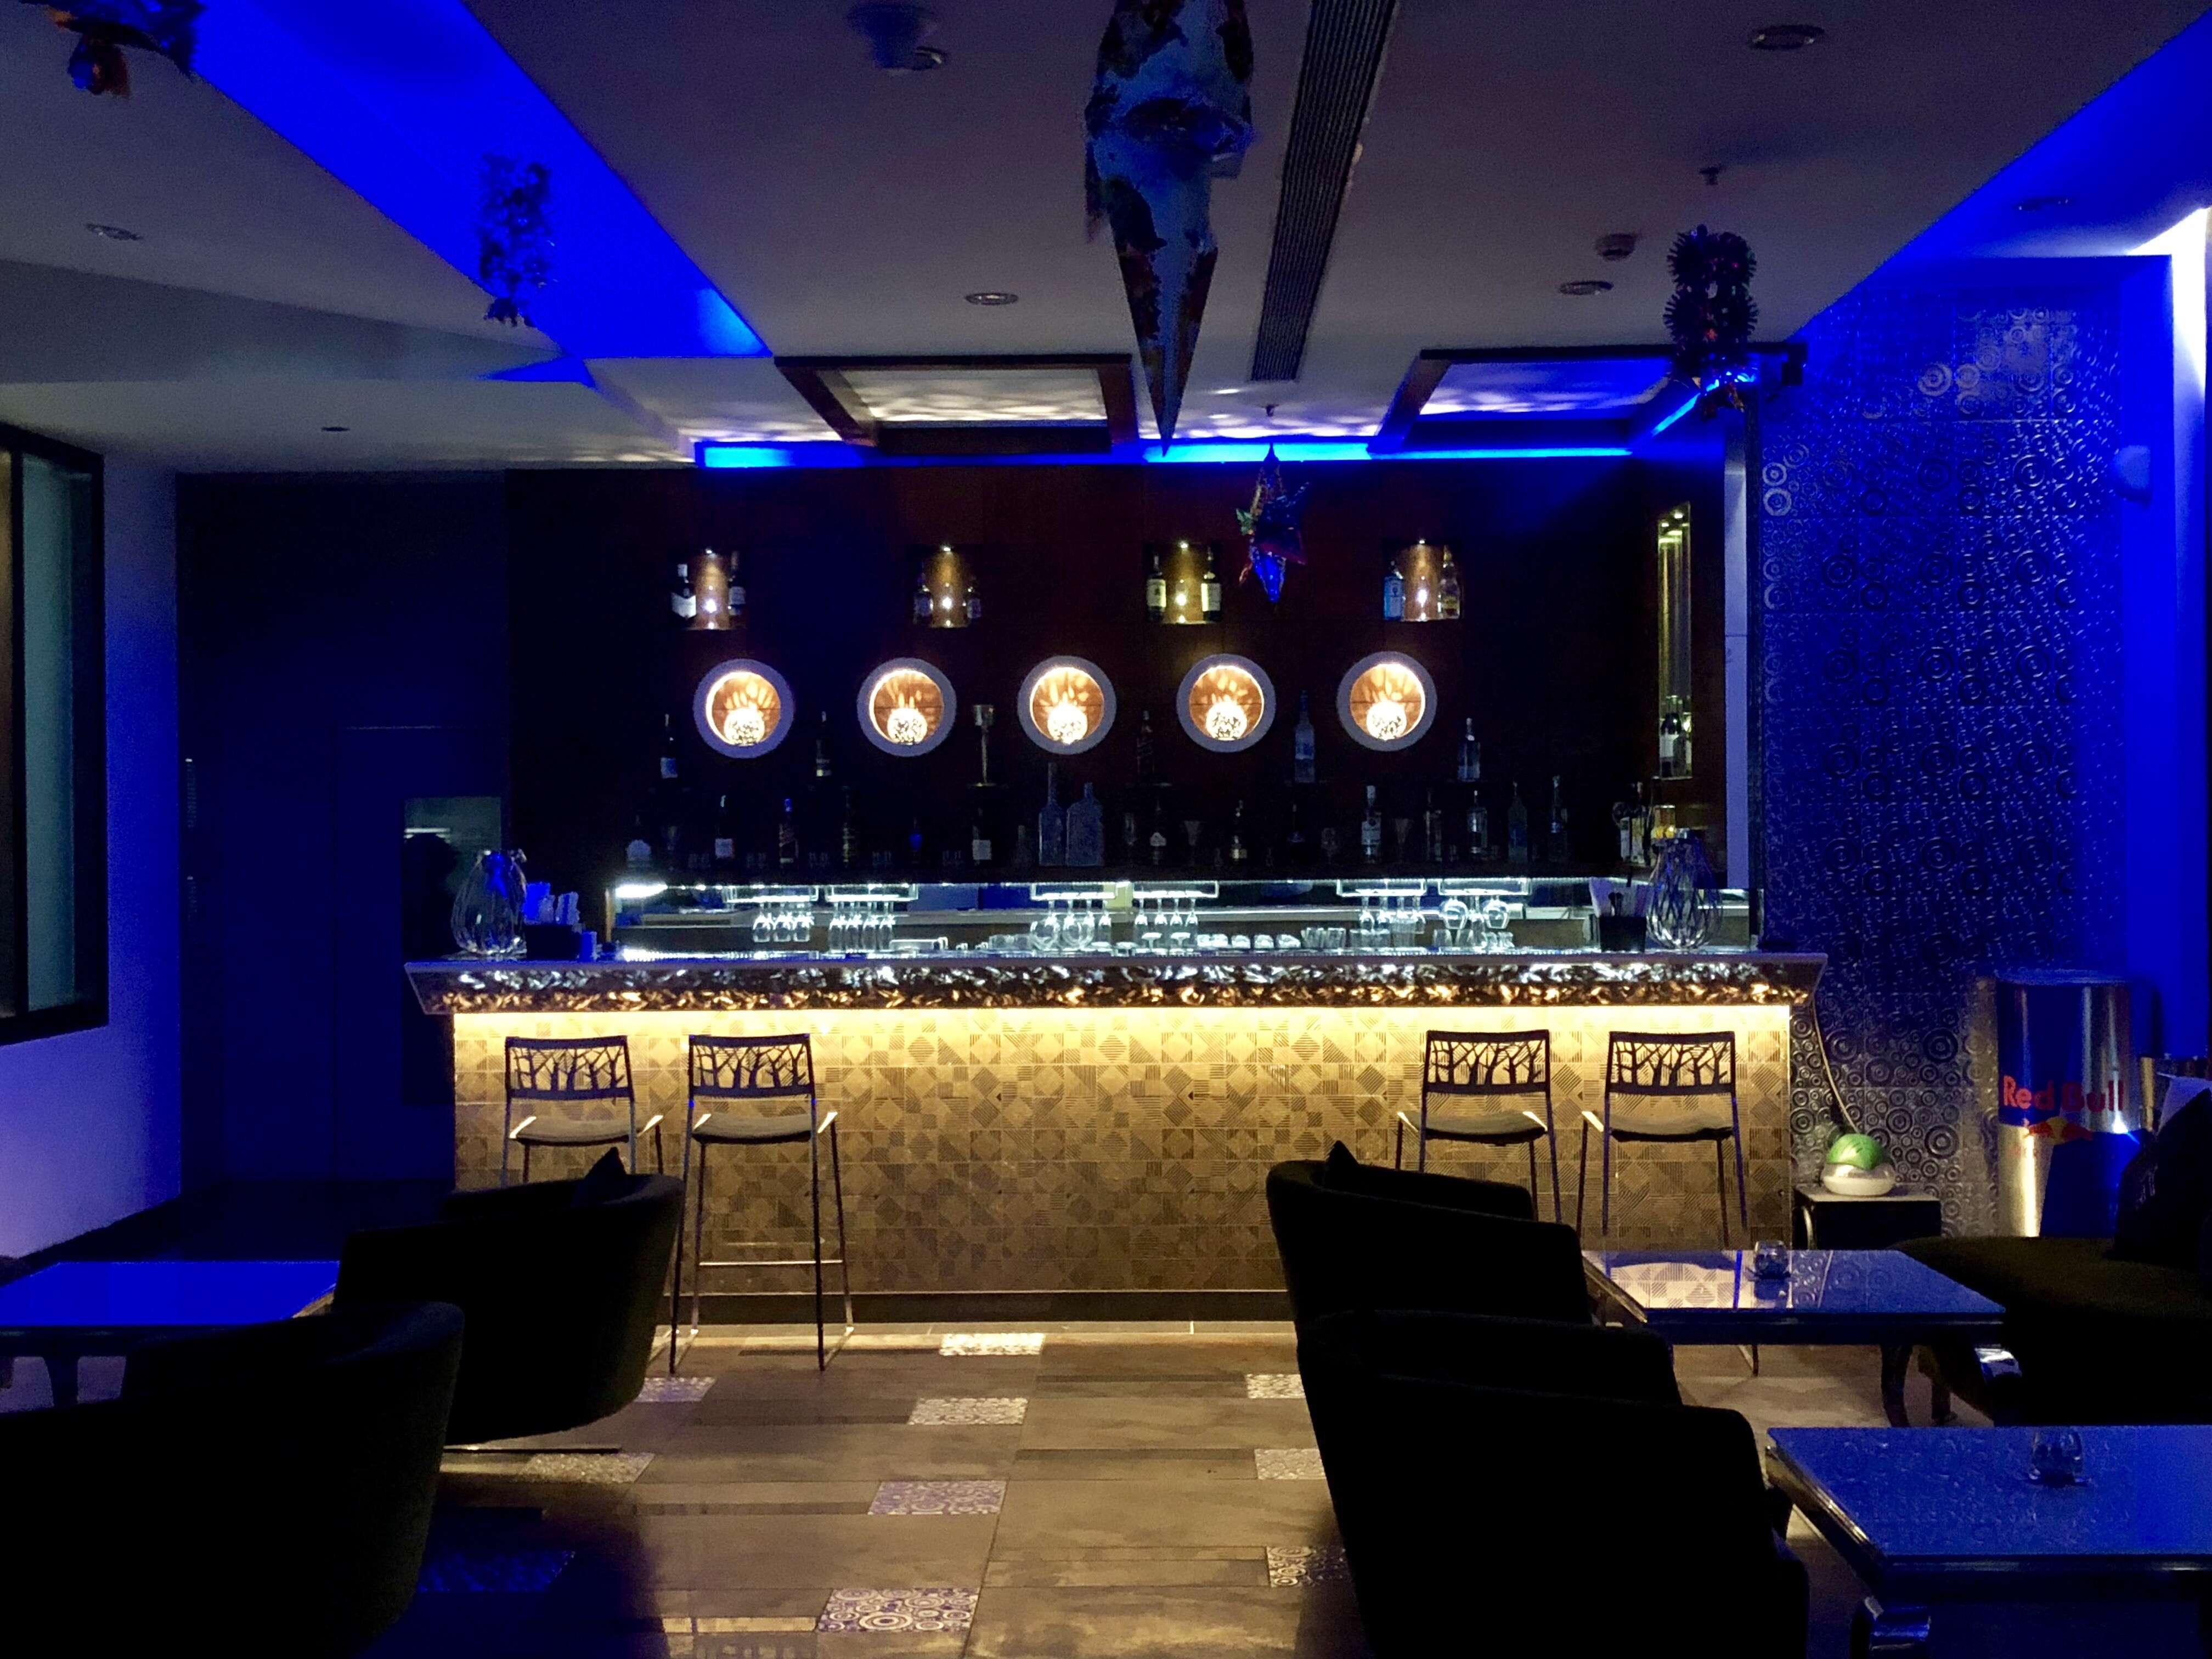 Hi-5 - The Lounge Bar - Jayadev Vihar - Bhubaneswar Image